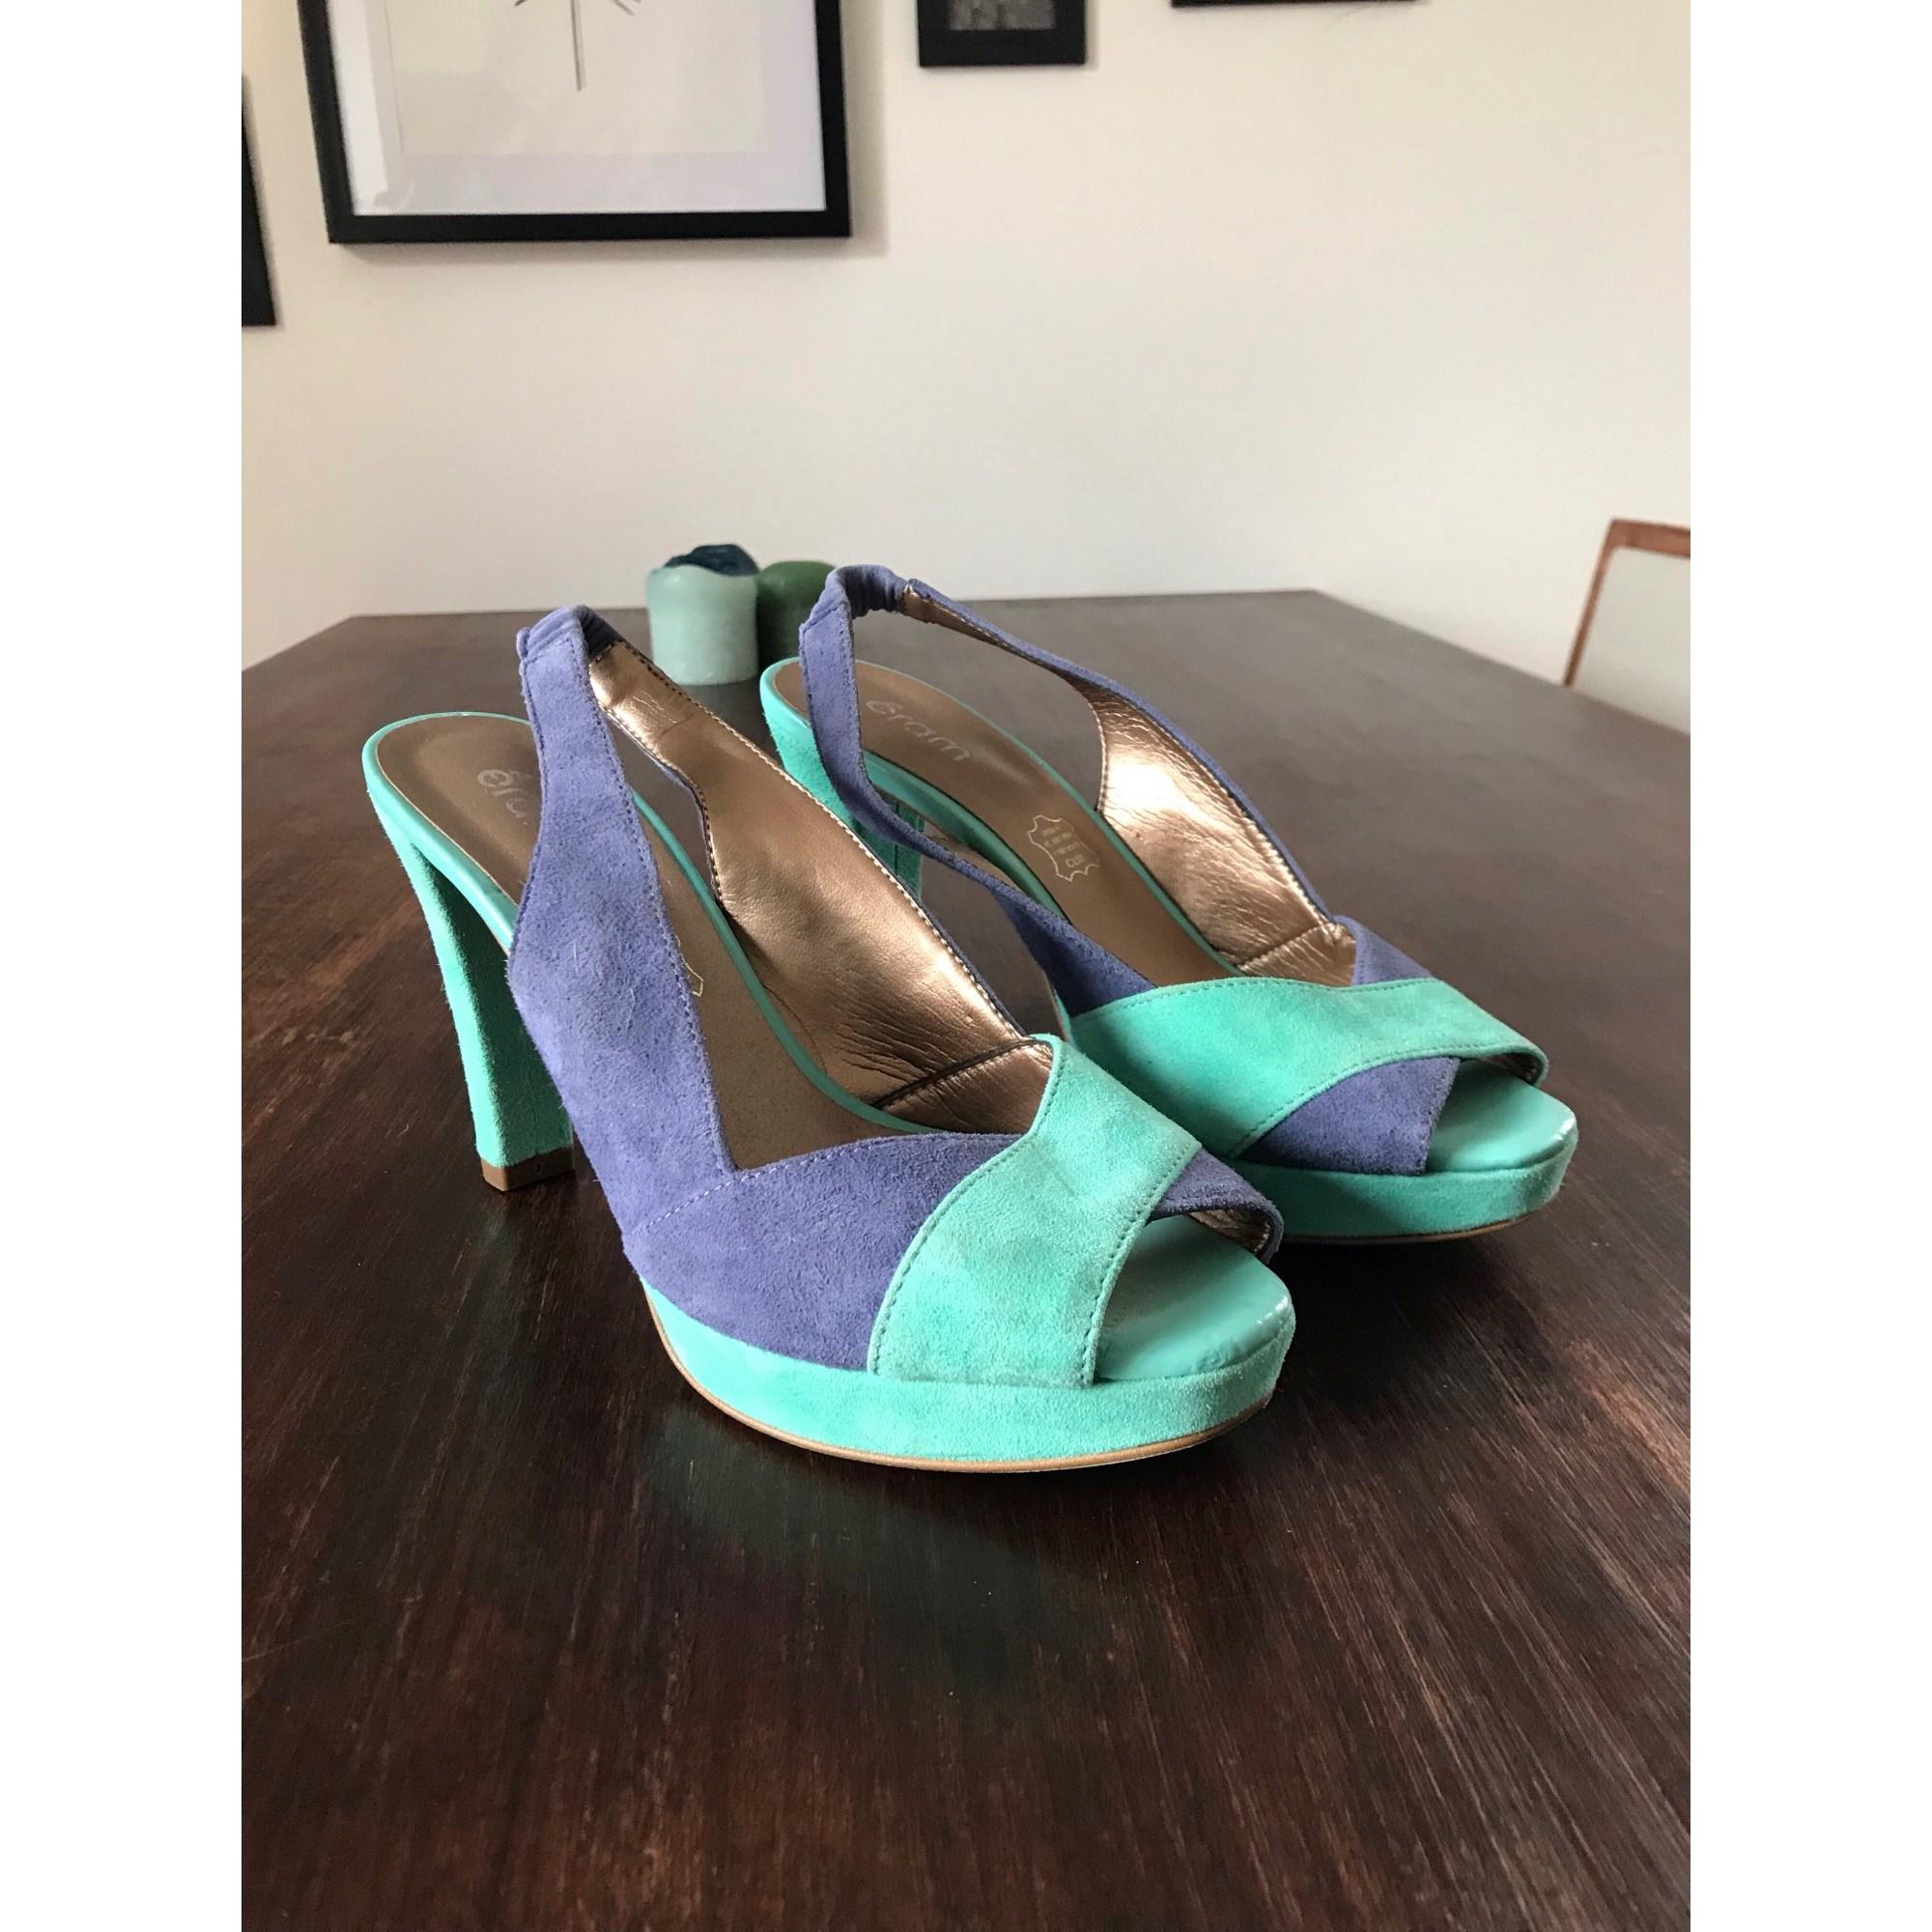 Sandales à talons ERAM Bleu, bleu marine, bleu turquoise